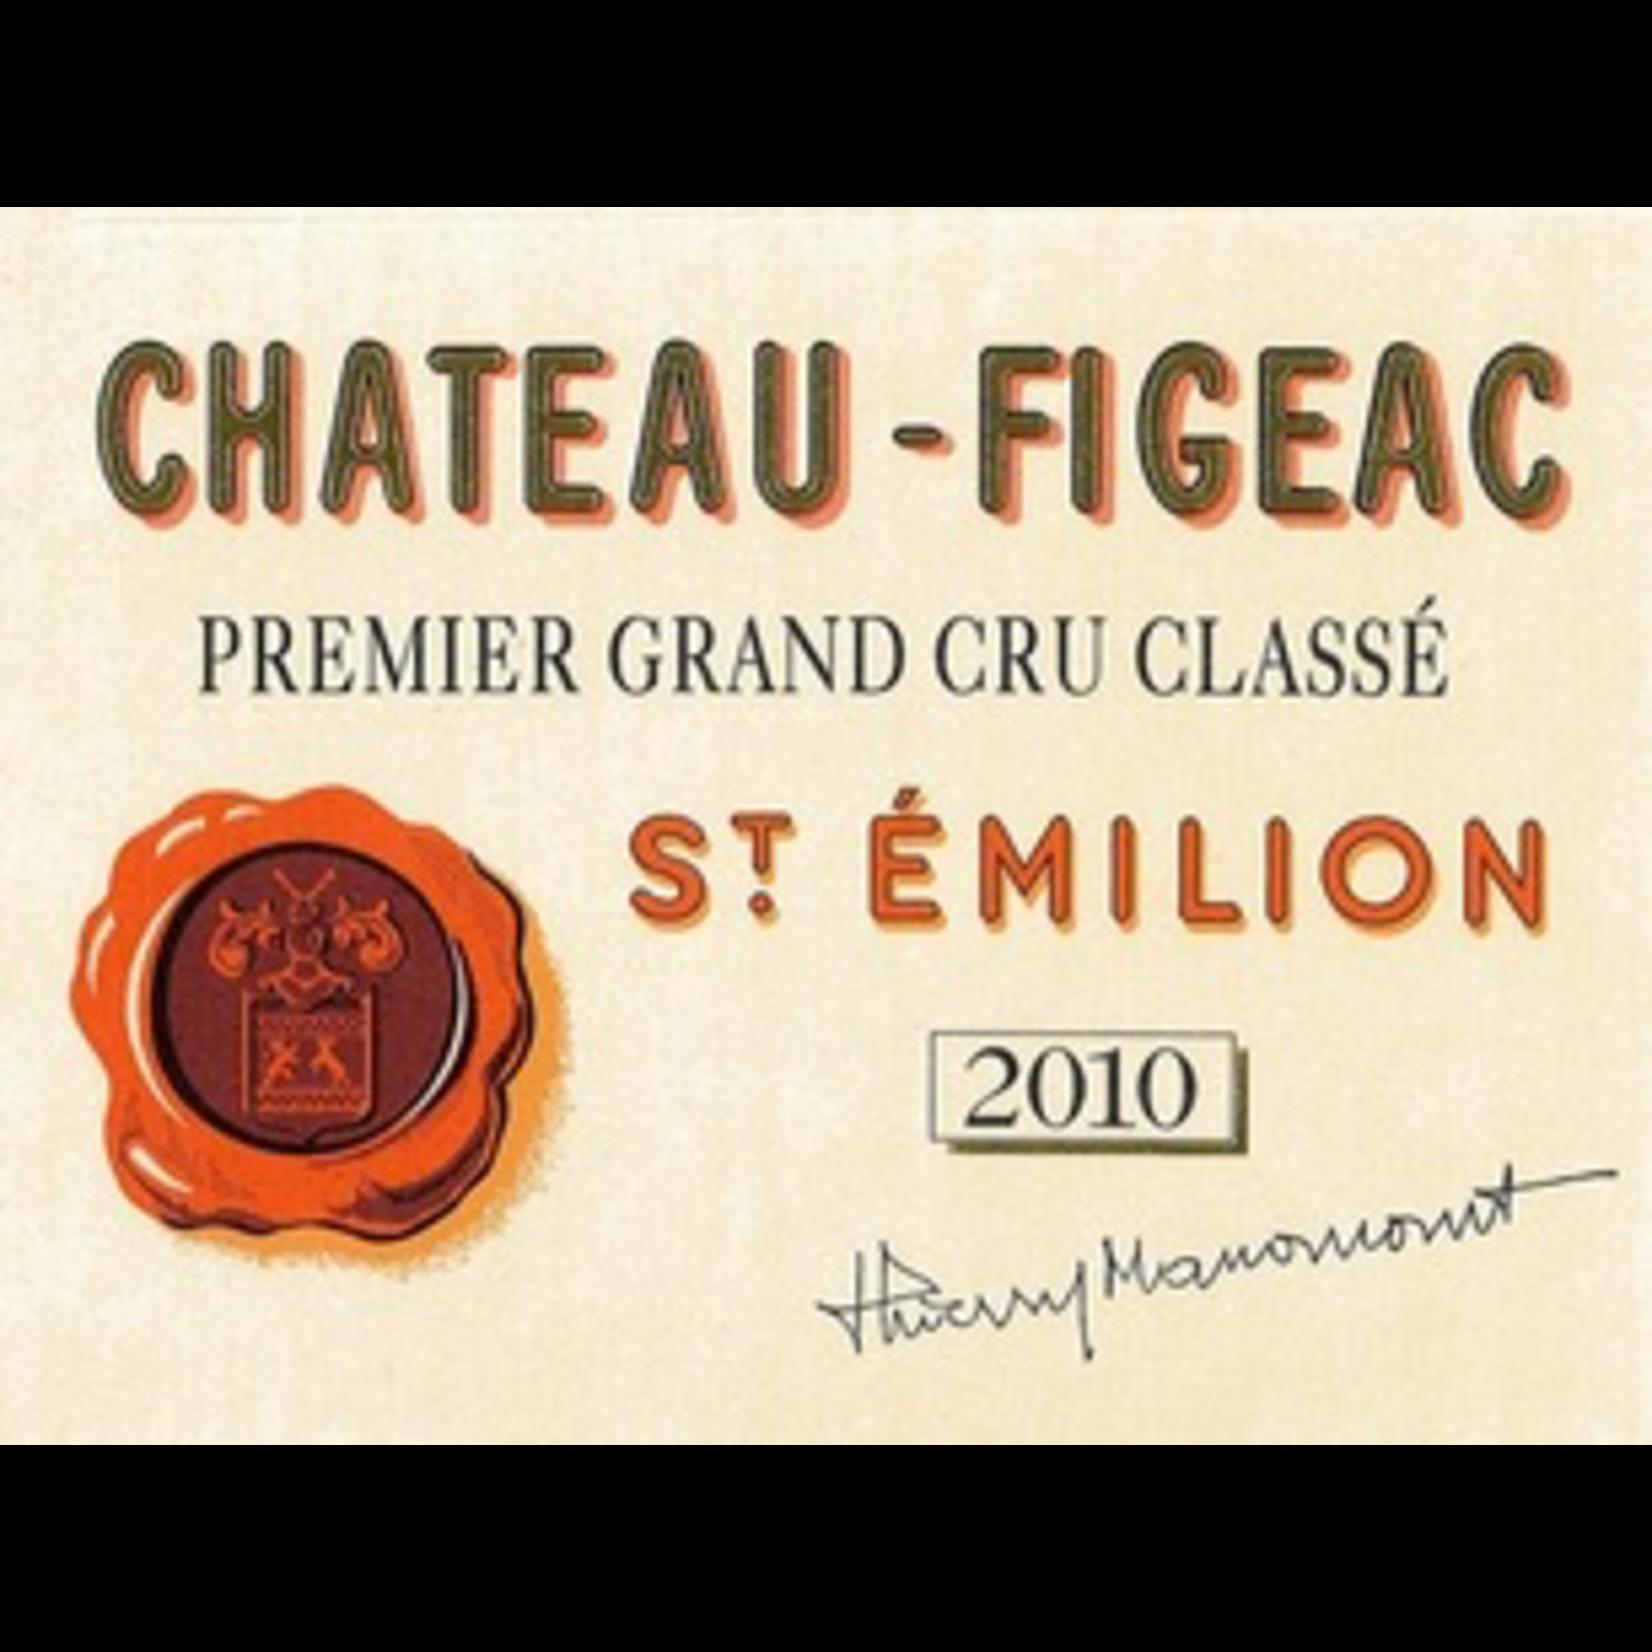 Wine Chateau Figeac 2010